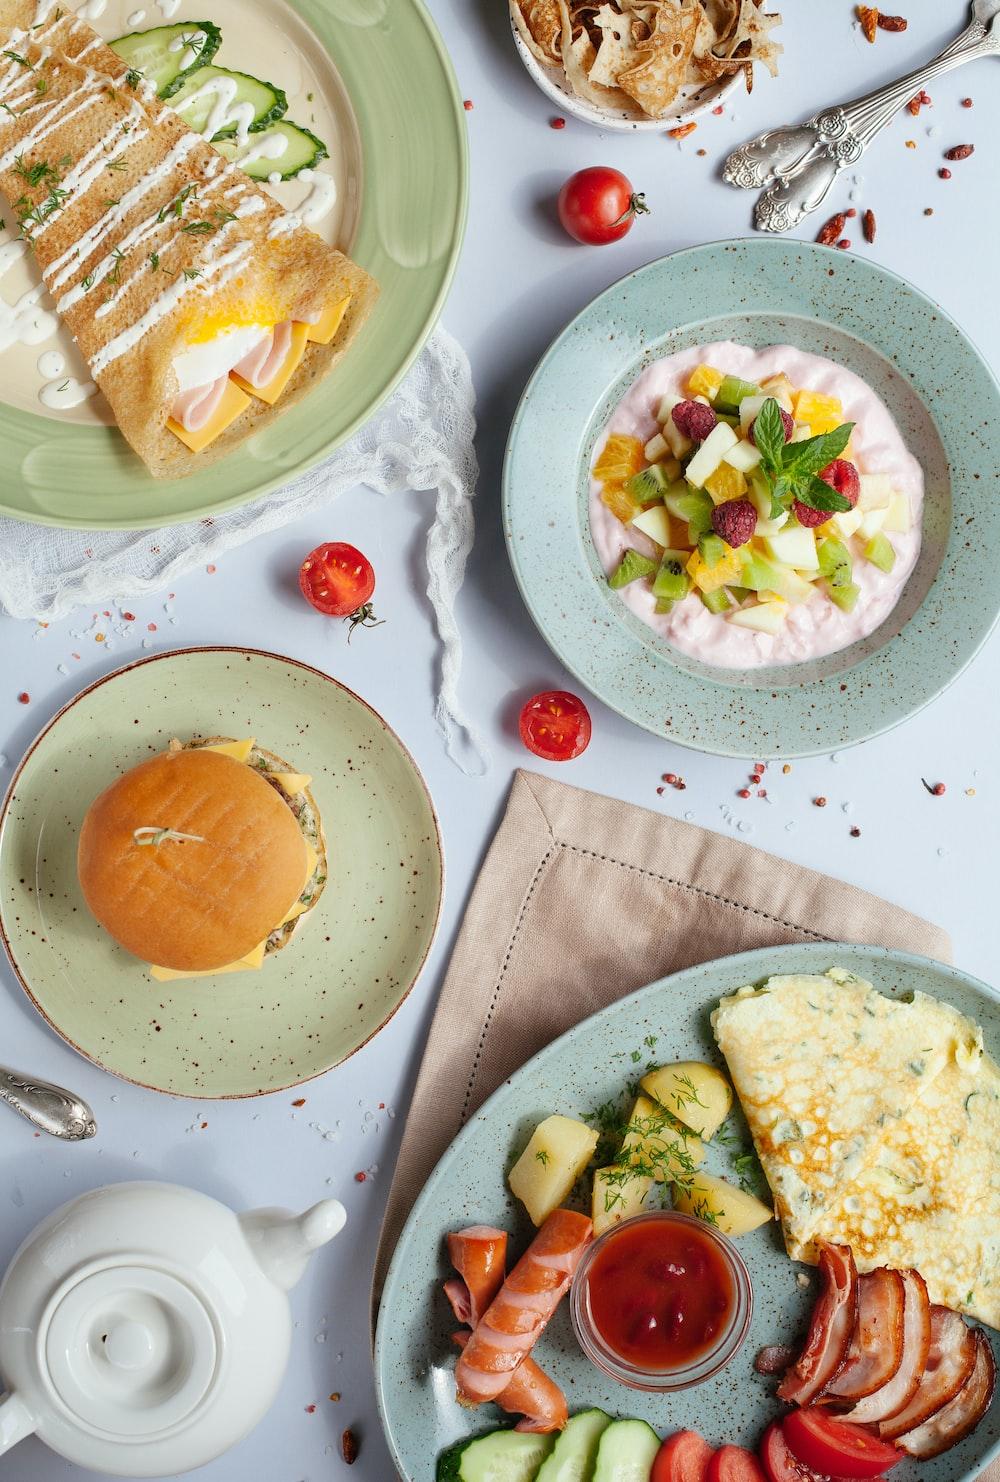 burger and egg on plates